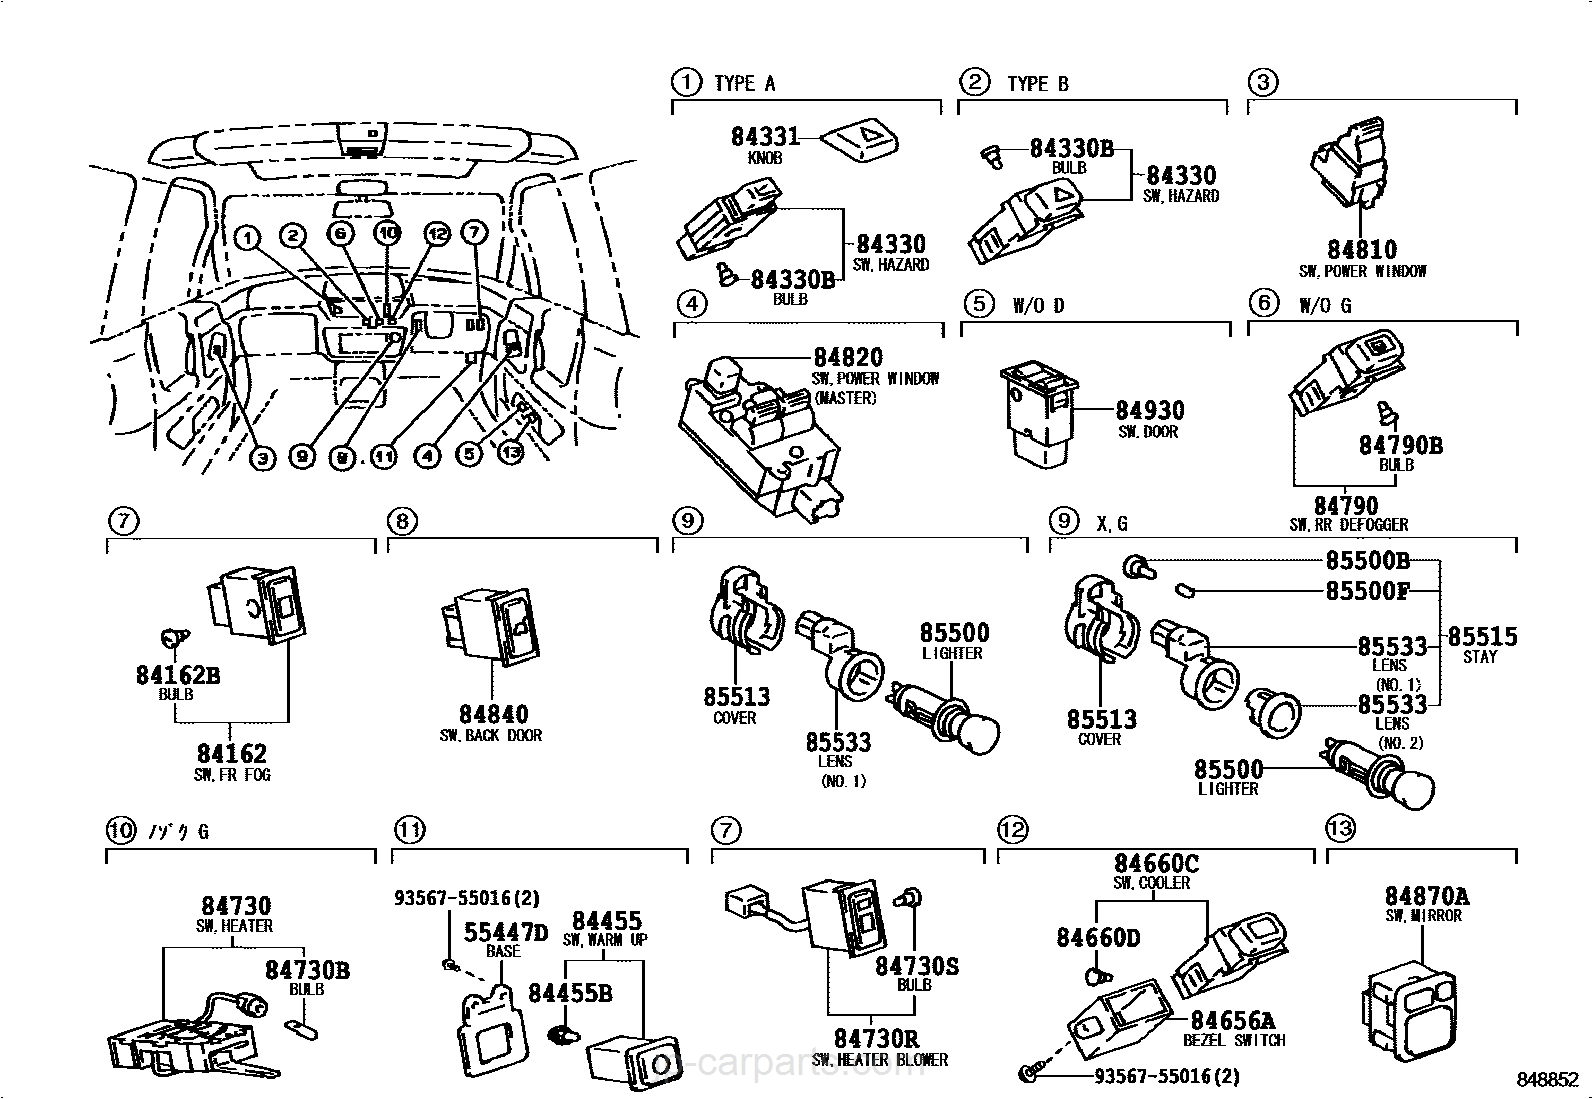 Toyota Emina Fuse Box Reinvent Your Wiring Diagram Previa Plug Experts Of U2022 Rh Evilcloud Co Uk 1997 Van